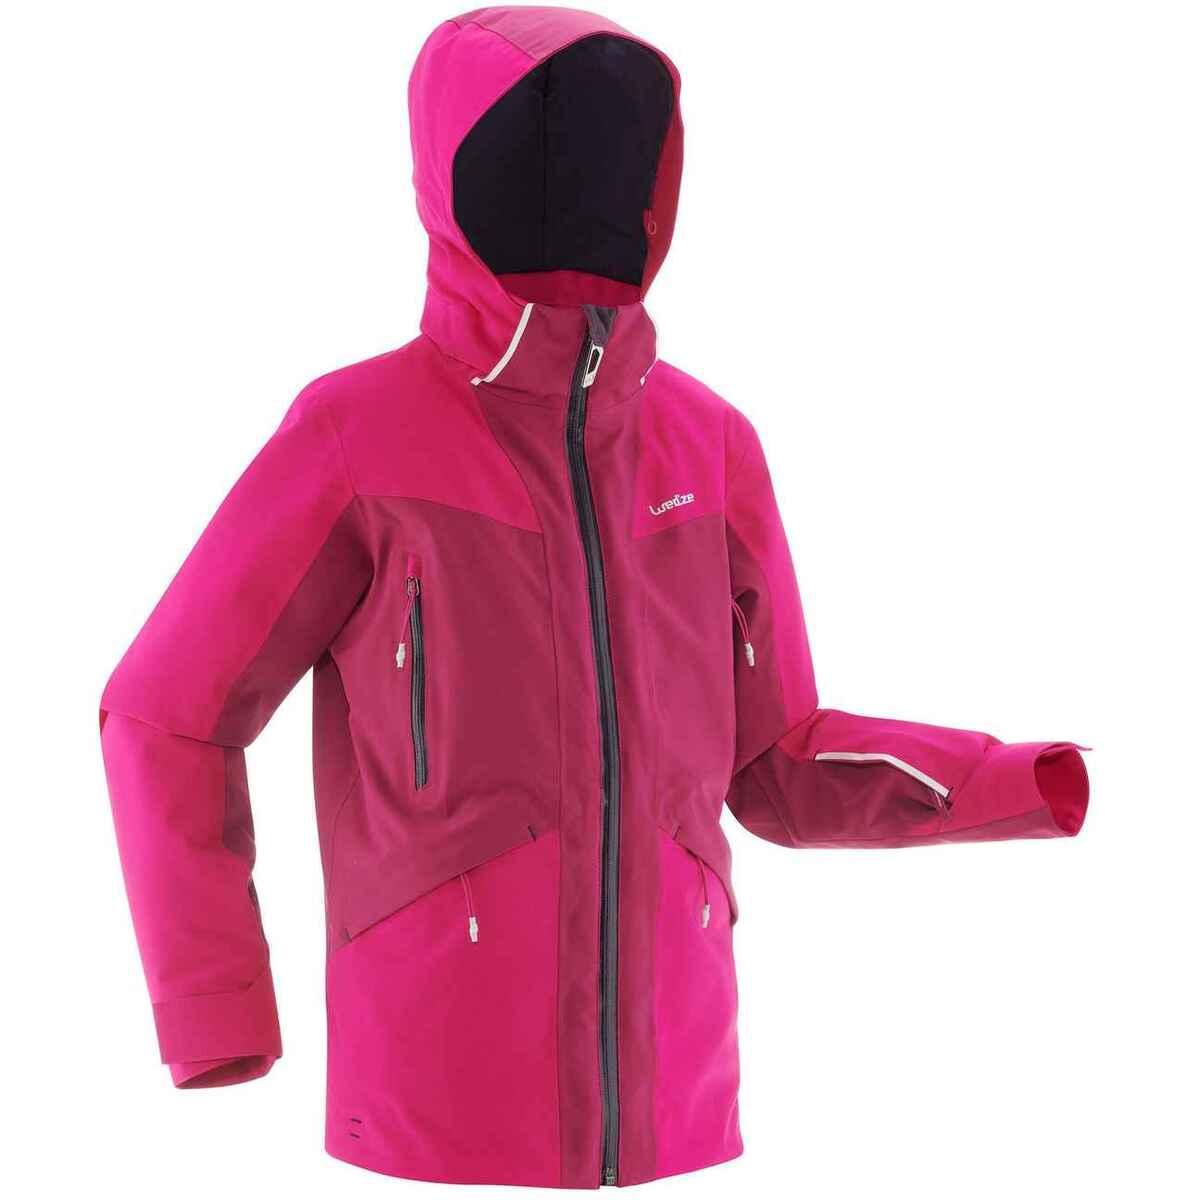 Bild 1 von Skijacke Piste 900 Kinder rosa/violett